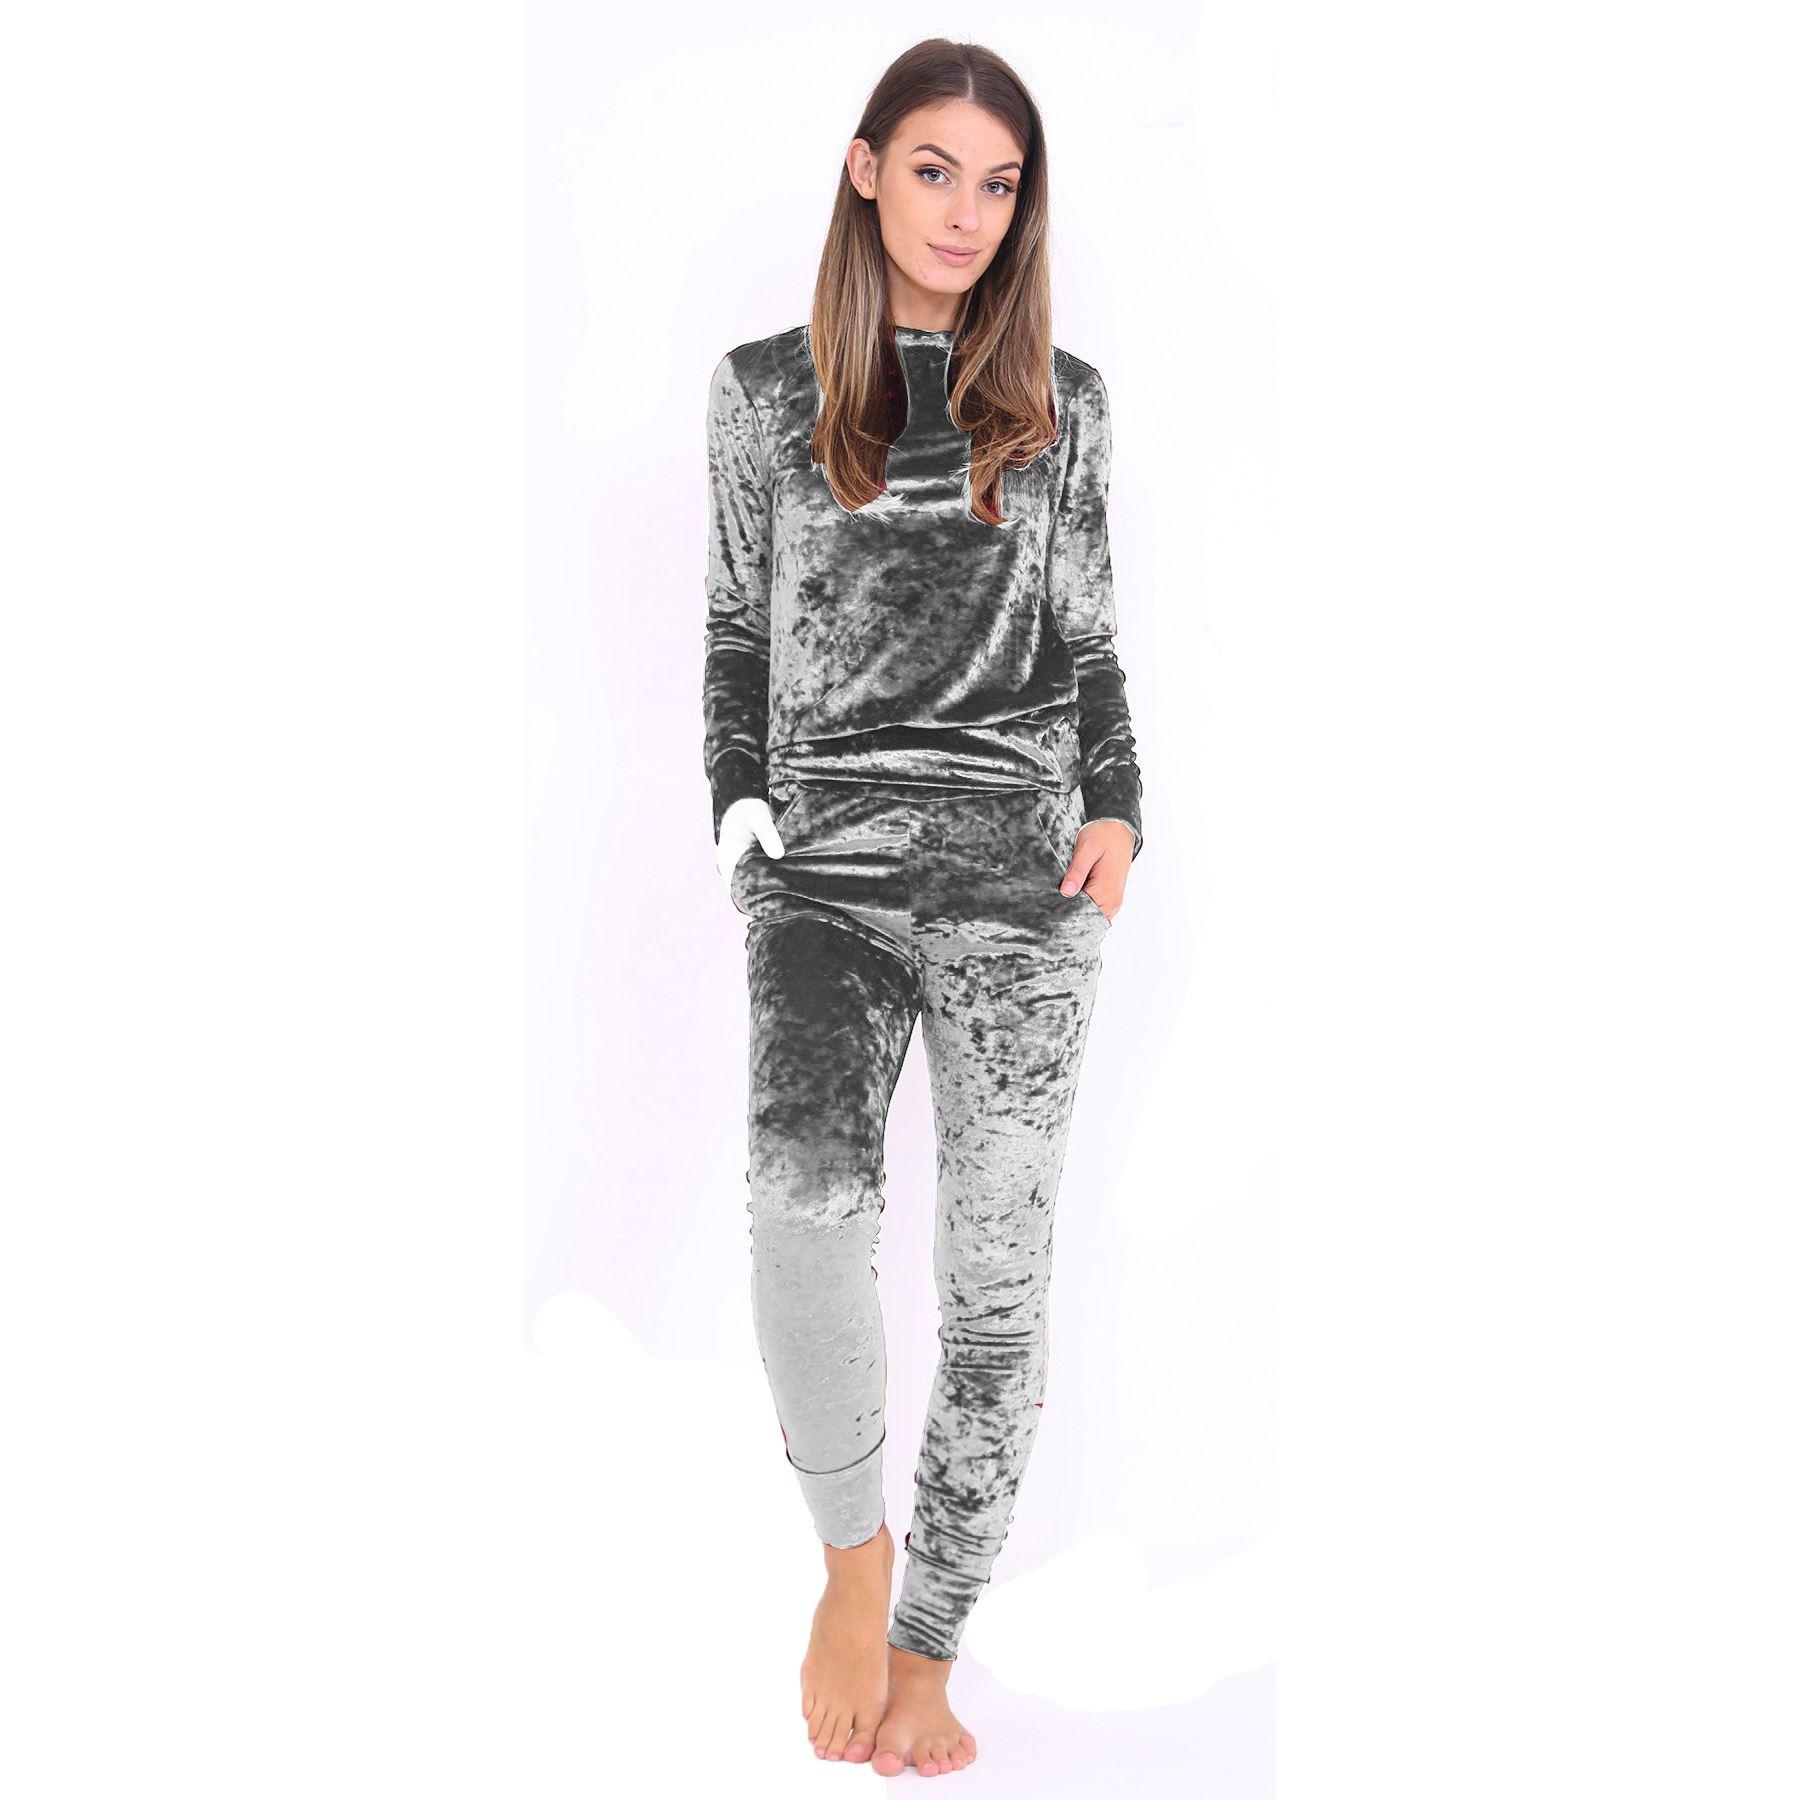 New Womens Crushed Velour Velvet Jogger Loungewear 2 Piece Co-ordinate  Tracksuit d510350524